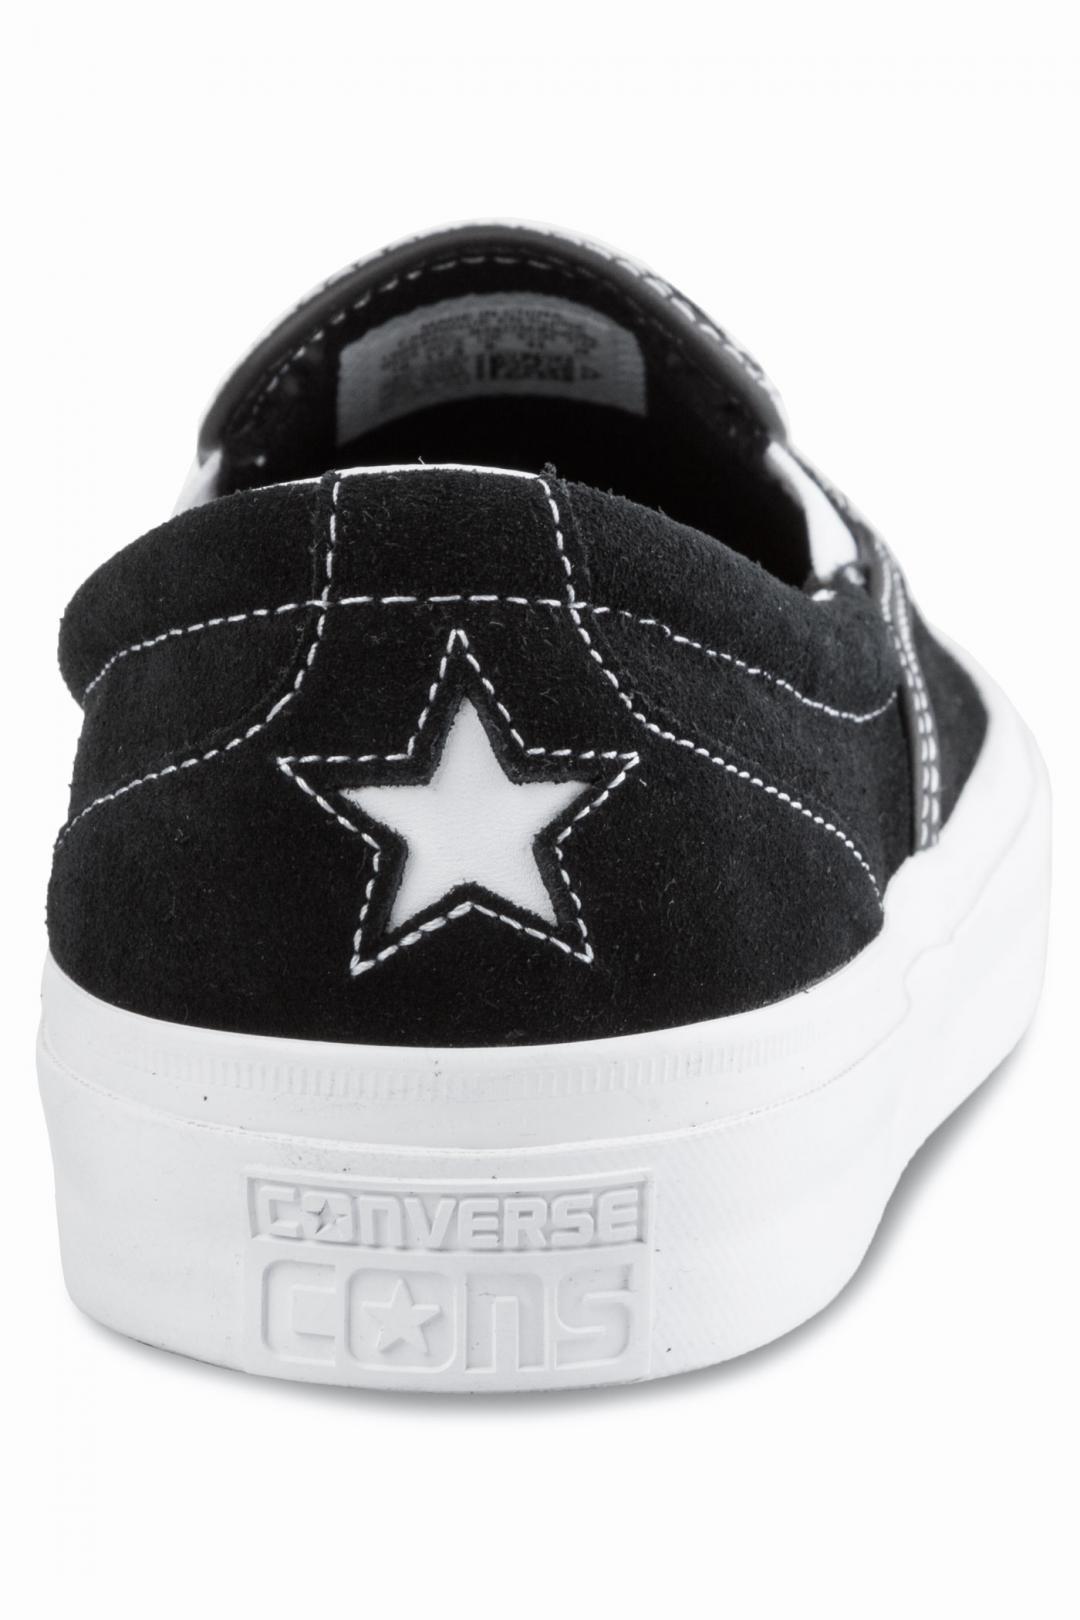 Uomo Converse CONS One Star CC Slip black white black   Sneakers slip on